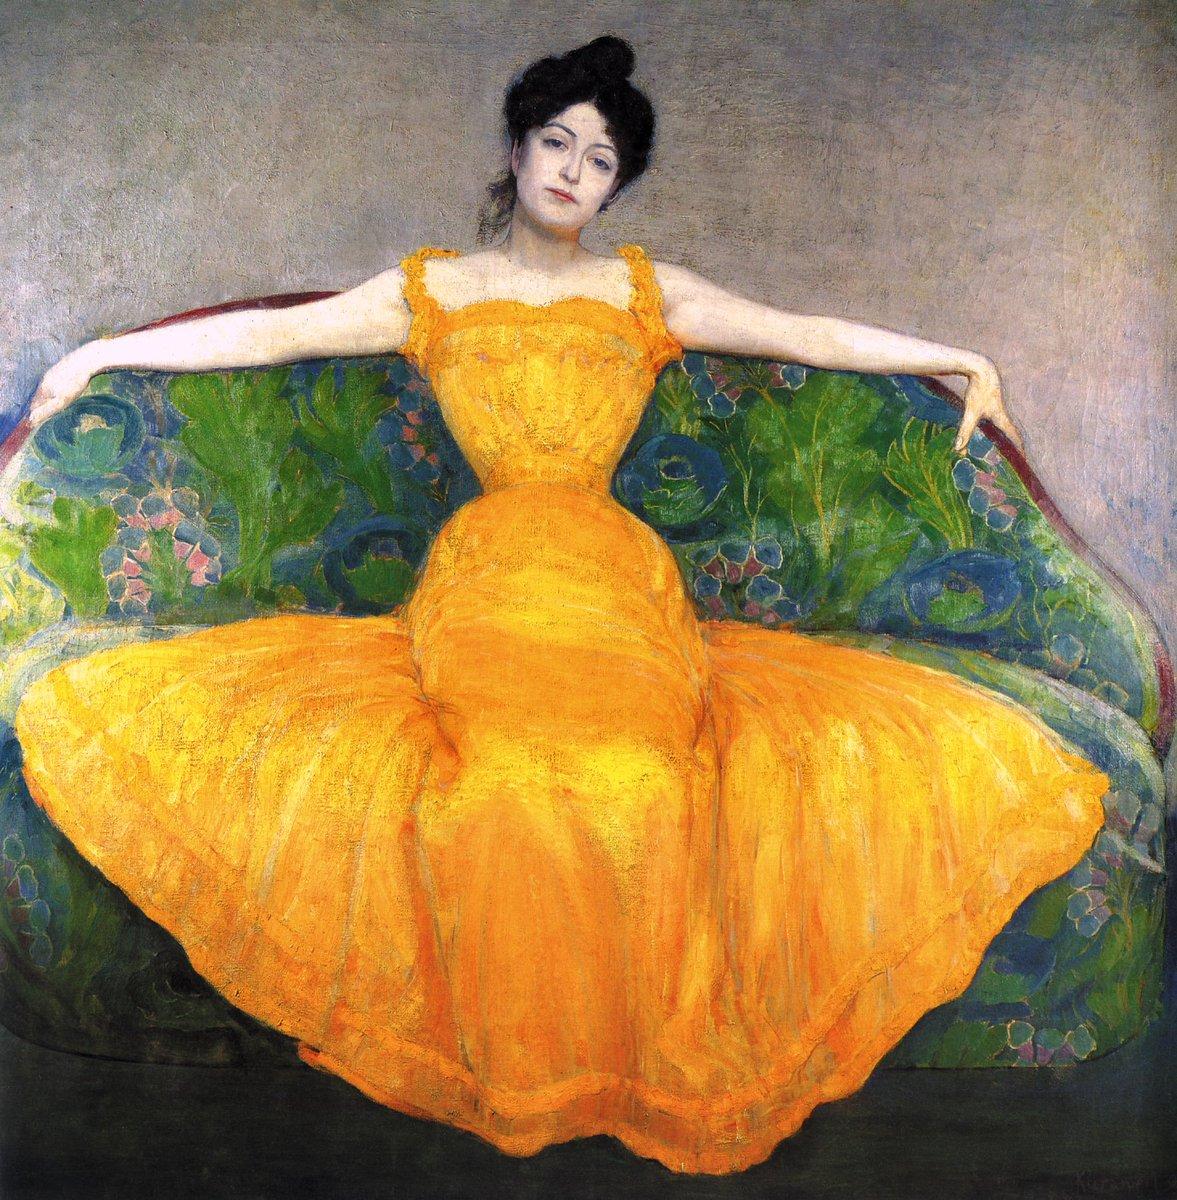 Woman in a Yellow Dress (1899) by Max Kurzweil (Czech, 1867-1916). #Victorian #VintageFashionpic.twitter.com/yXWf97zLxr